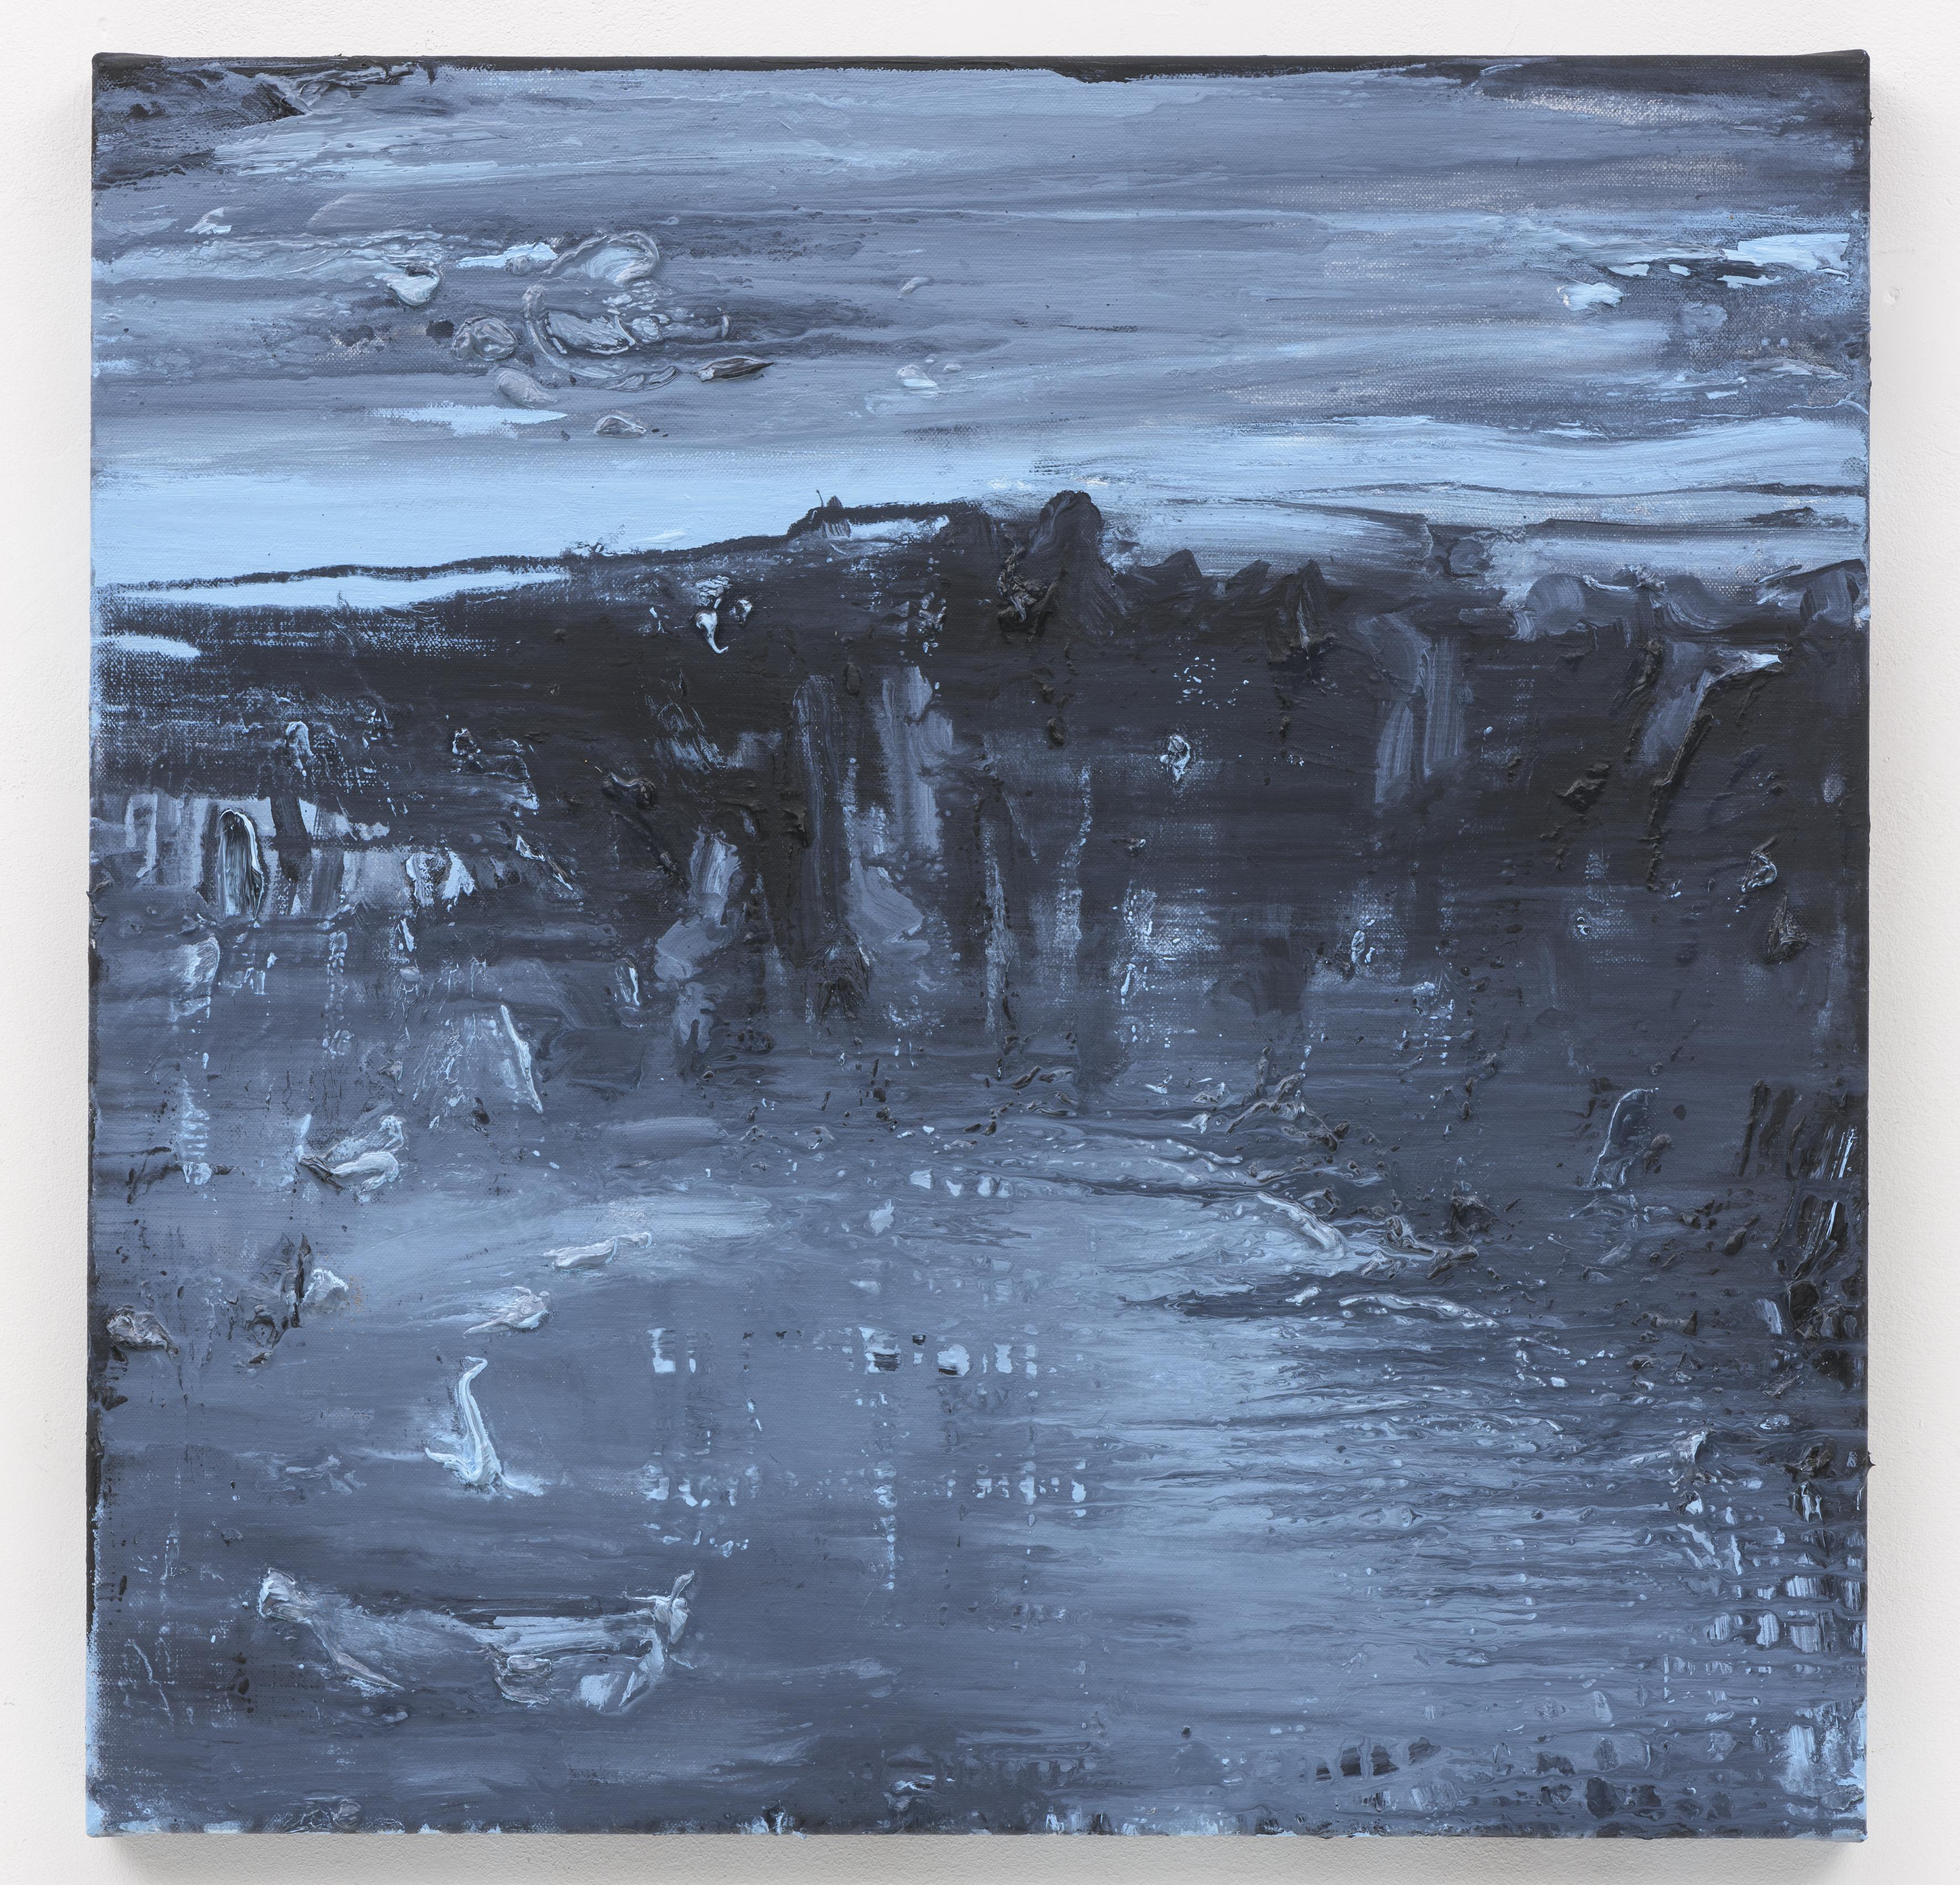 """A Hora Azul II"" 50 x 50 cm. oil on linen 2018 (Portugal)"